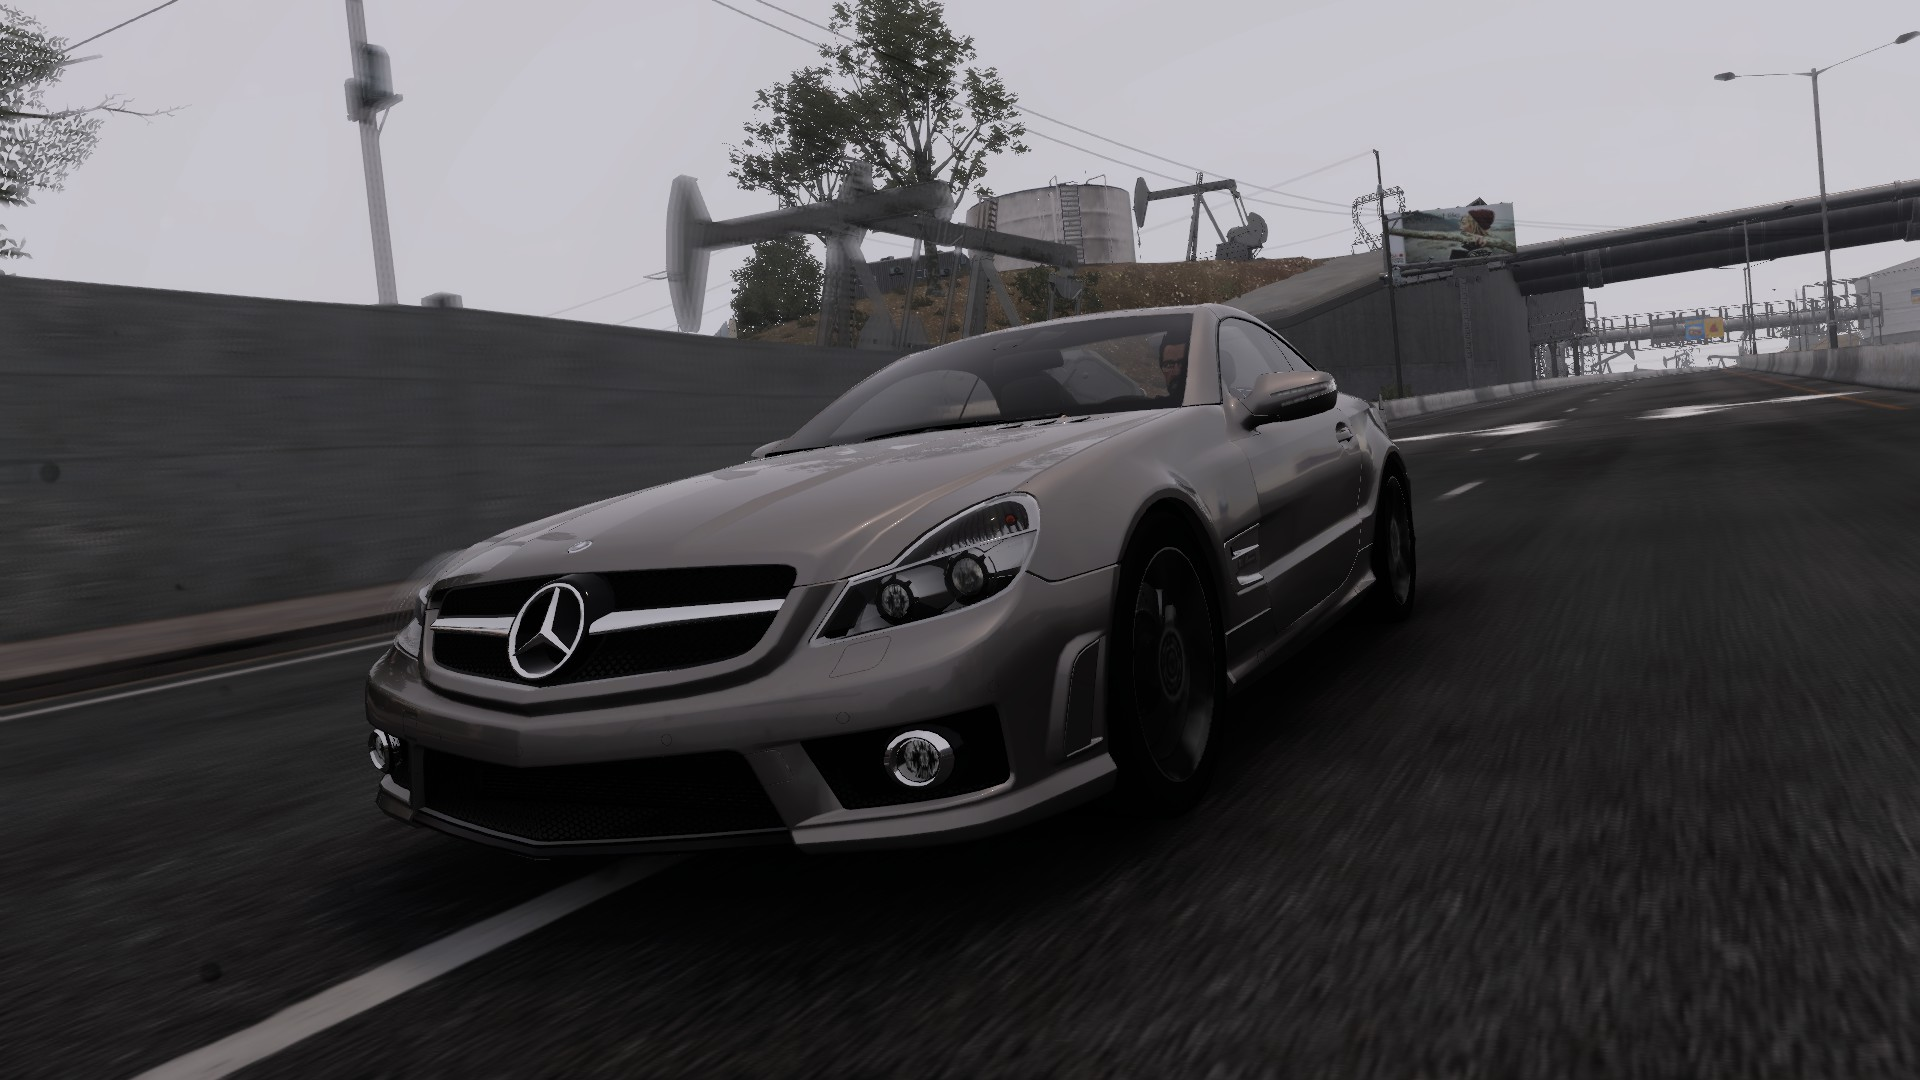 Mercedes benz sl 63 amg r230 the crew wiki fandom for Lb mercedes benz